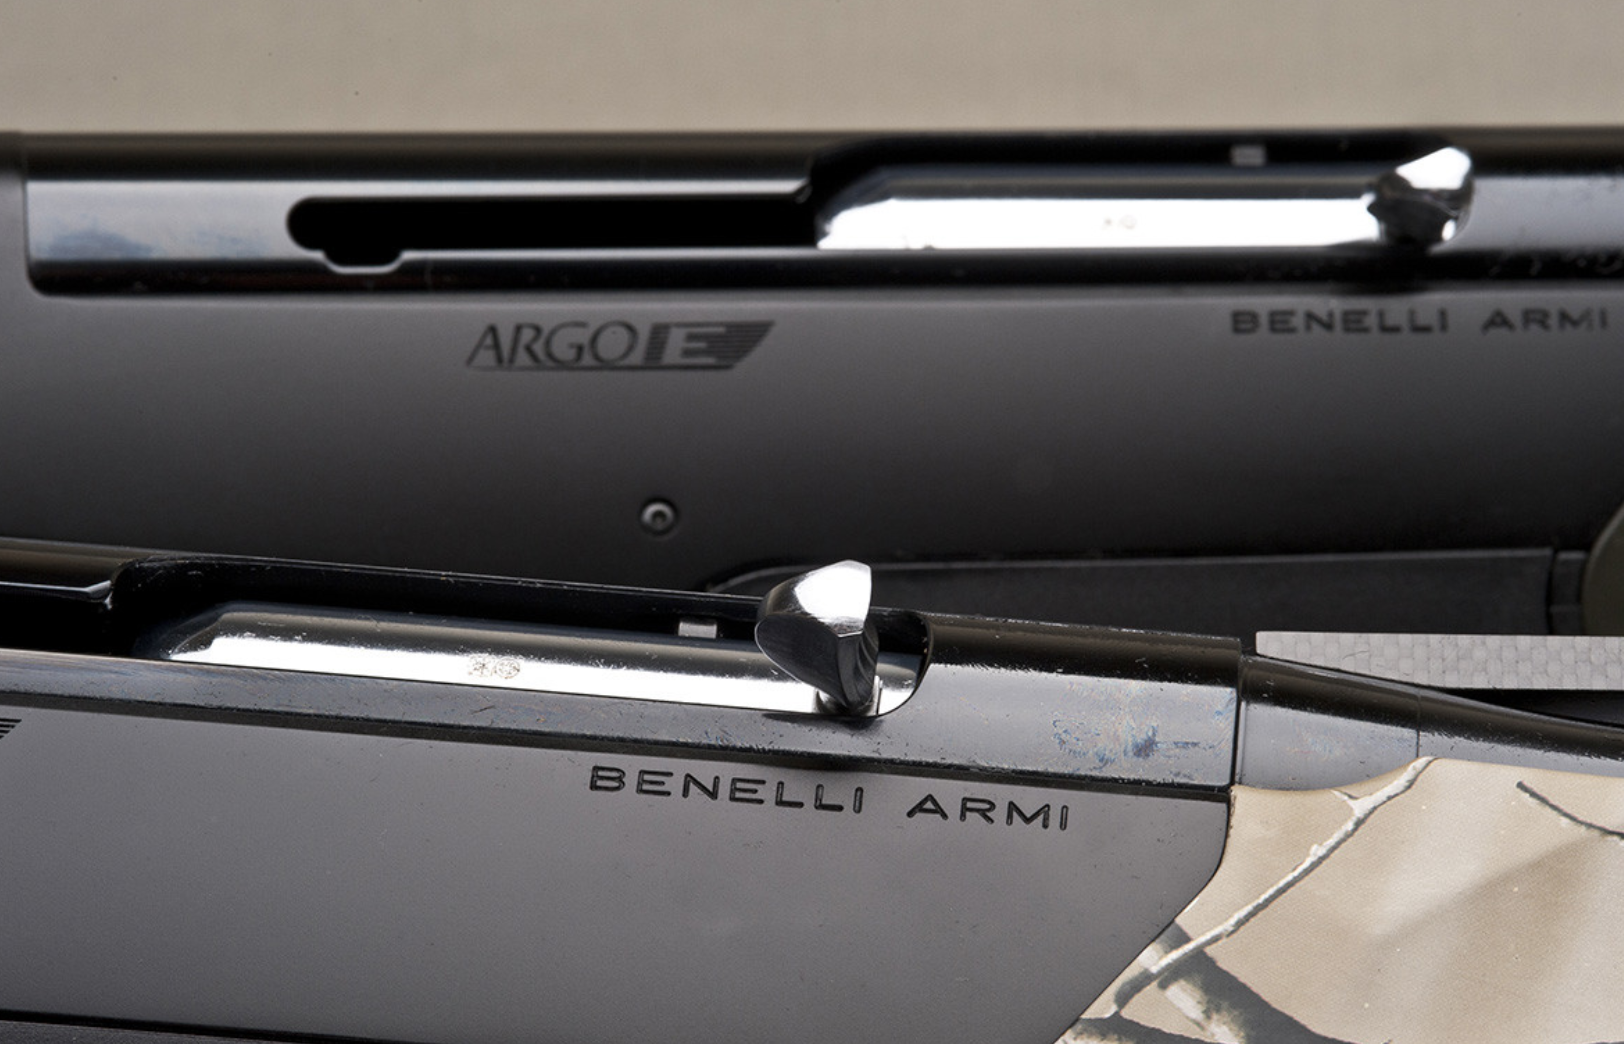 Carabina Semiautomatica ARGO E CONFORTECH - BENELLI